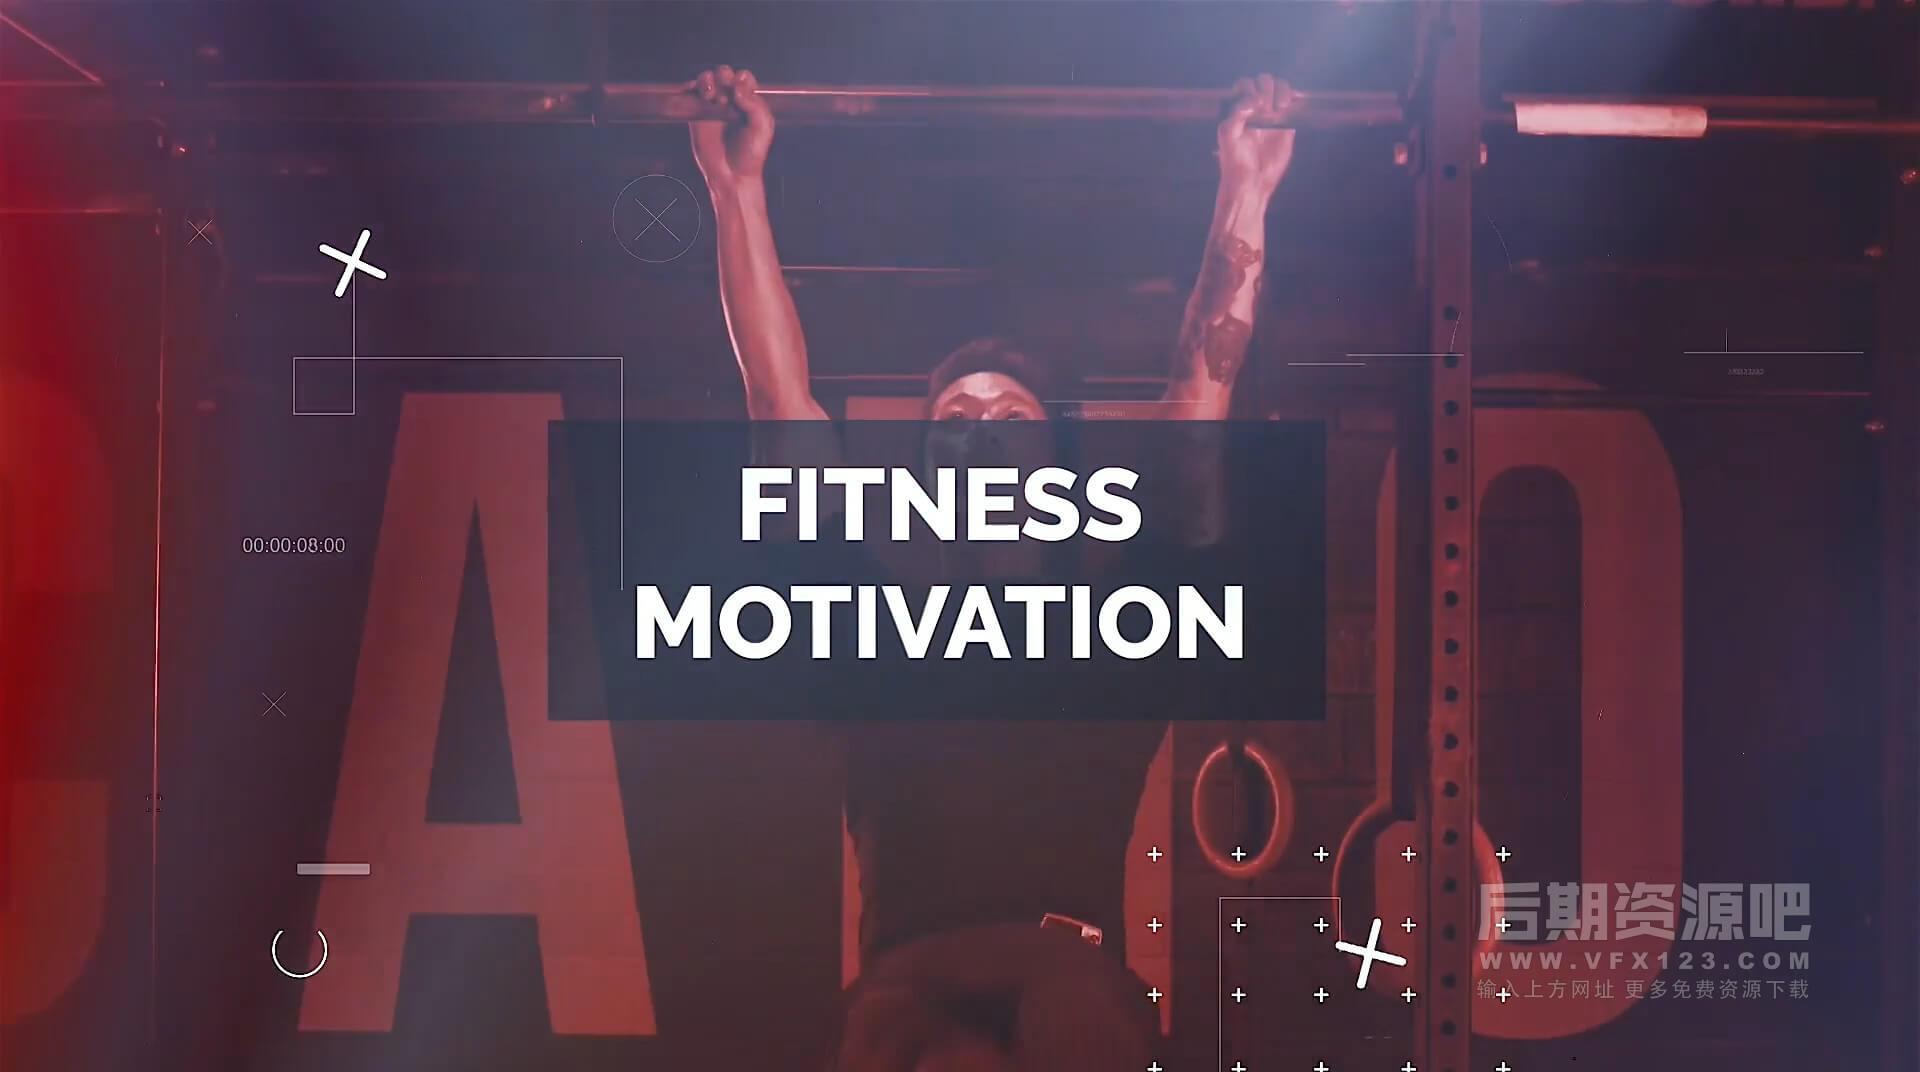 Fcpx主题模板 体育运动竞技流行故障干扰效果片头开场 Fitness Motivation